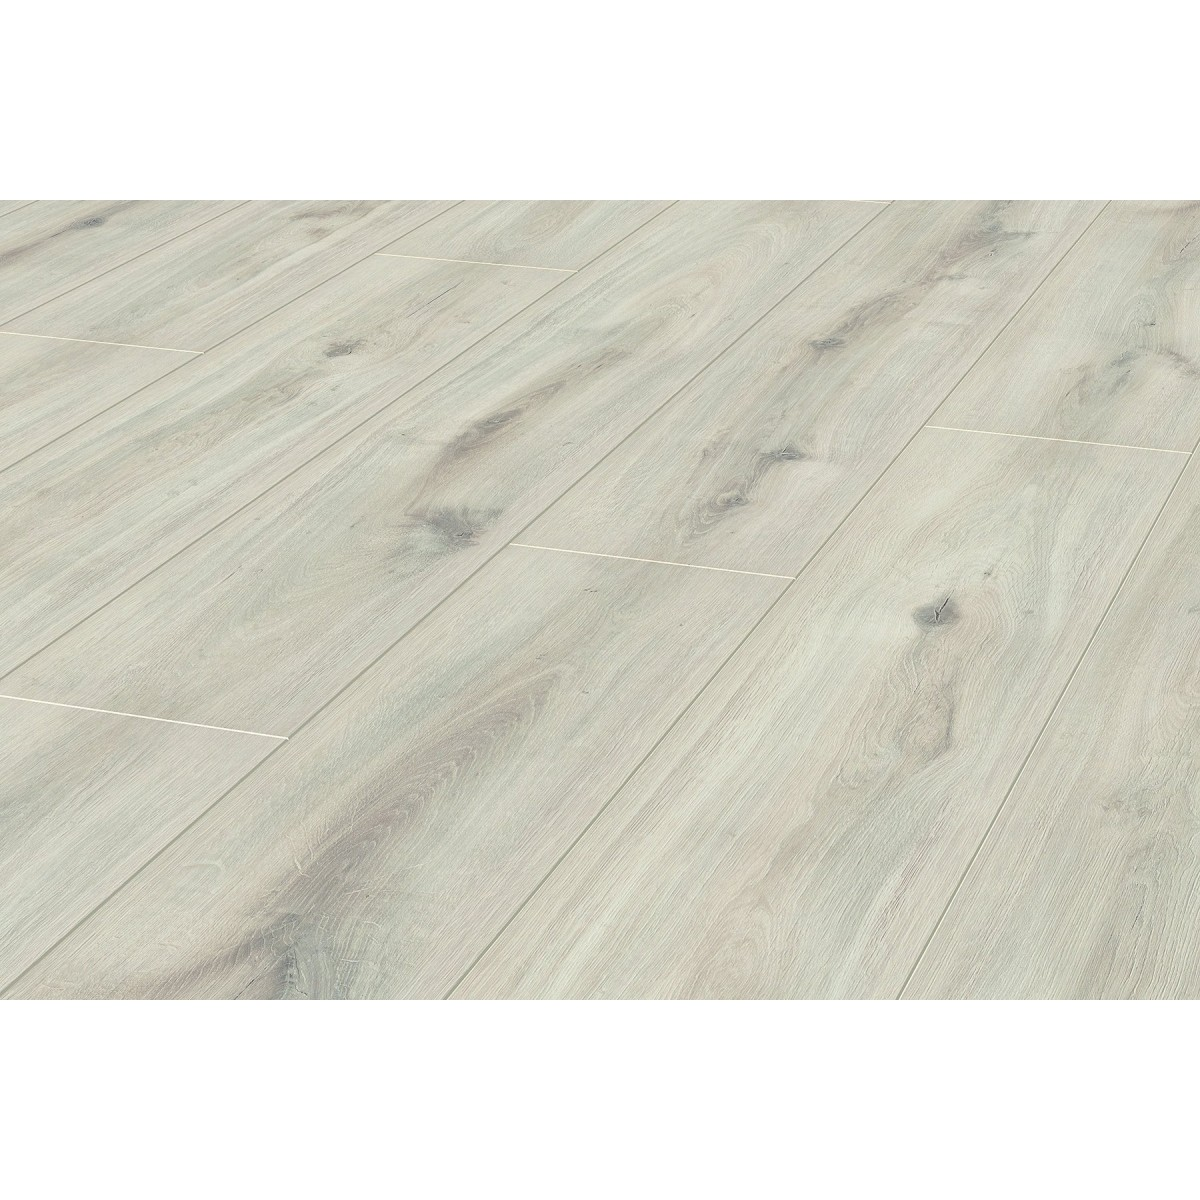 Vareprøve Laminat Krono 12mm MyStyle Misty Plains Oak